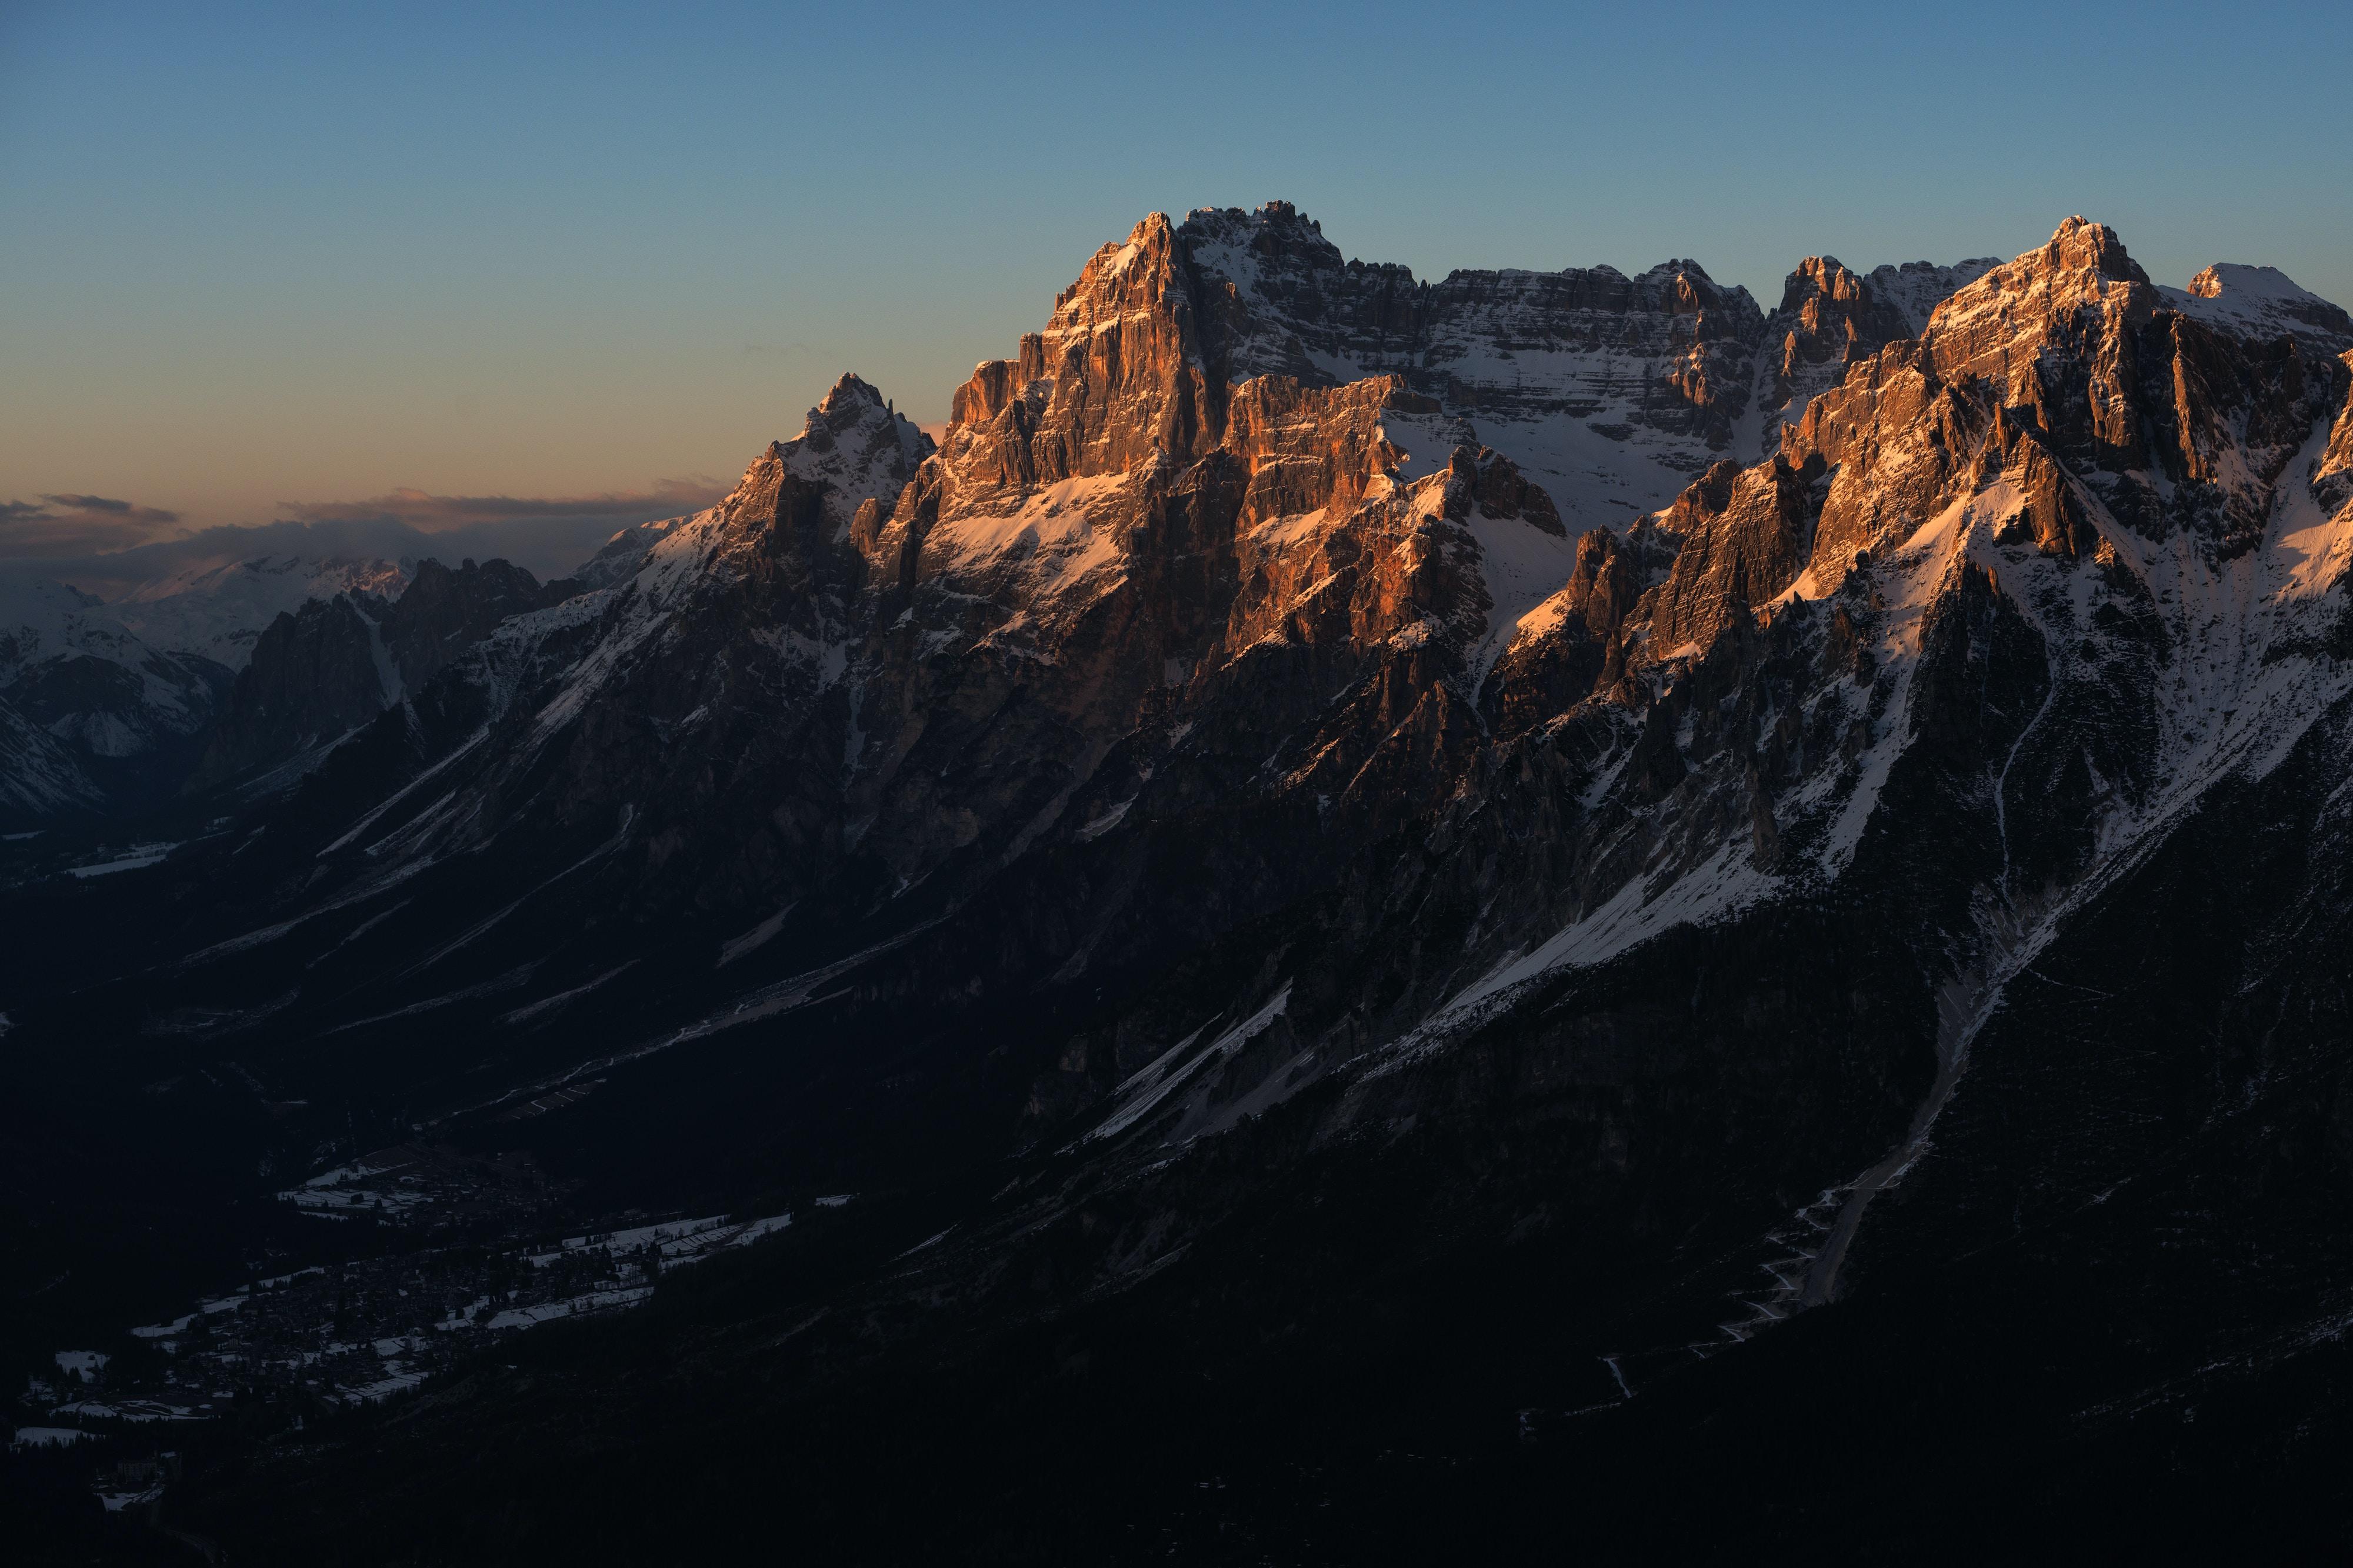 landscape photography of Mount Everest